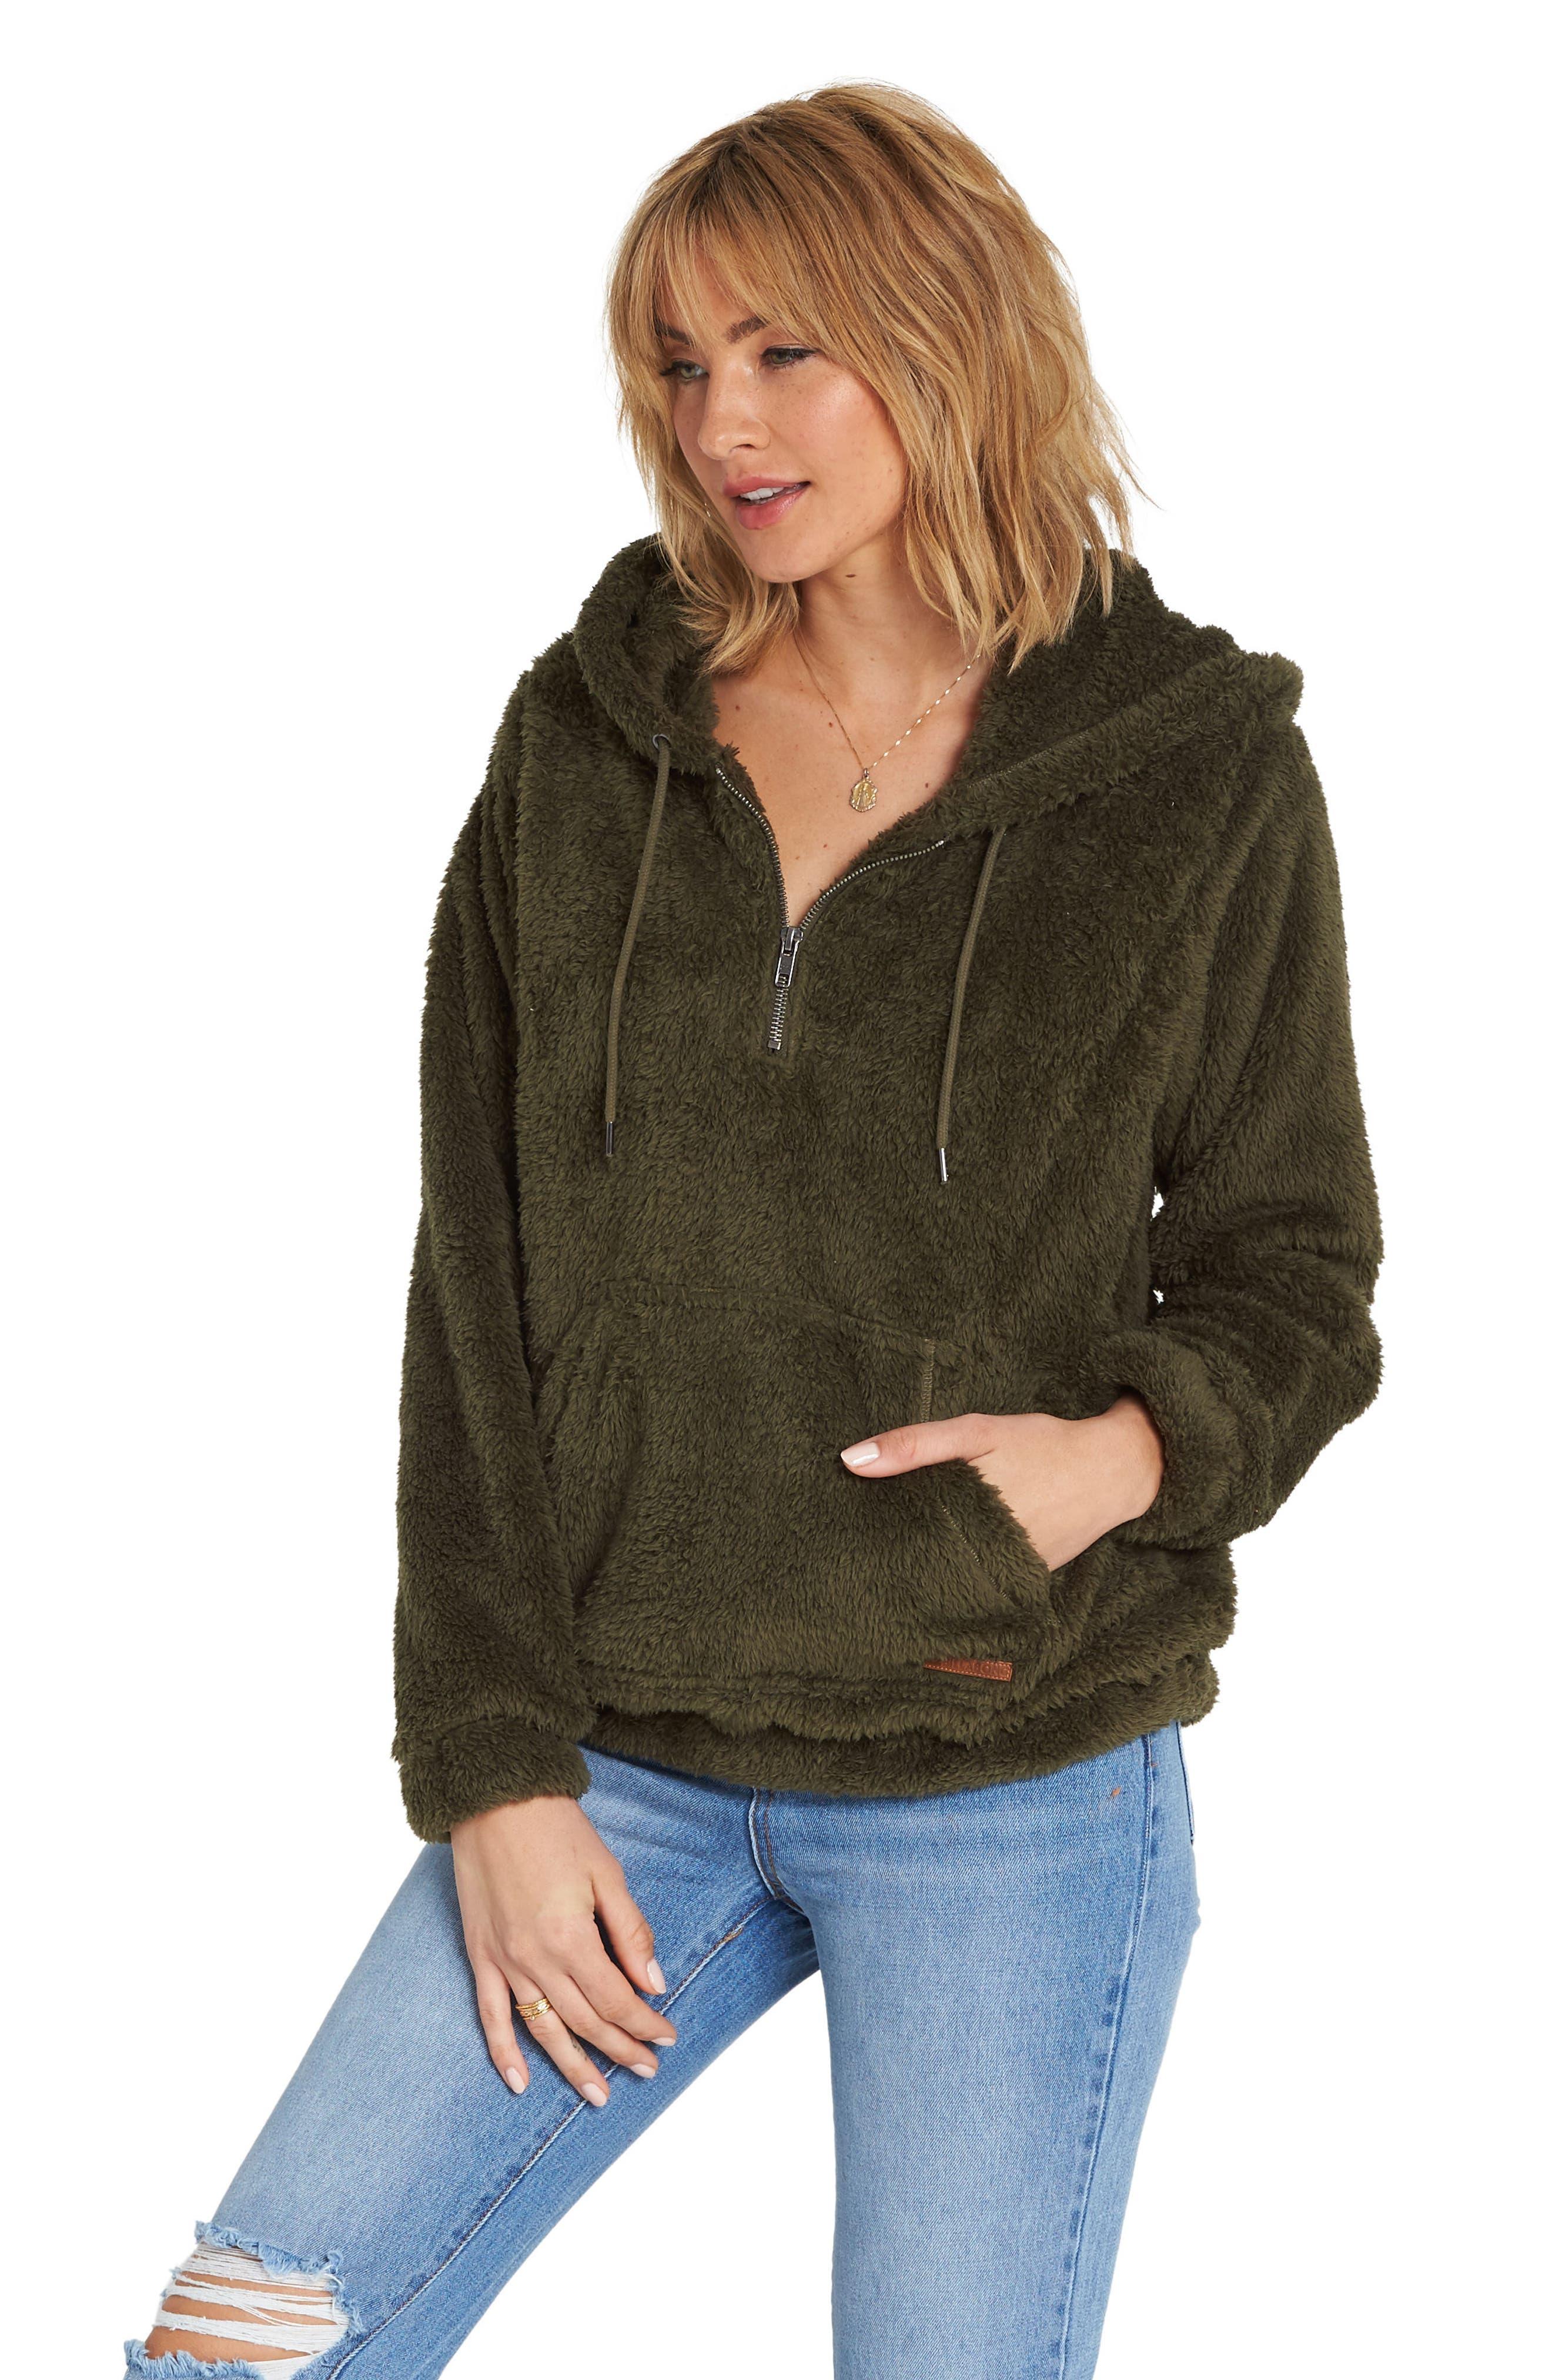 Cozy for Keeps Fleece Zip Hoodie,                             Alternate thumbnail 3, color,                             OLIVE